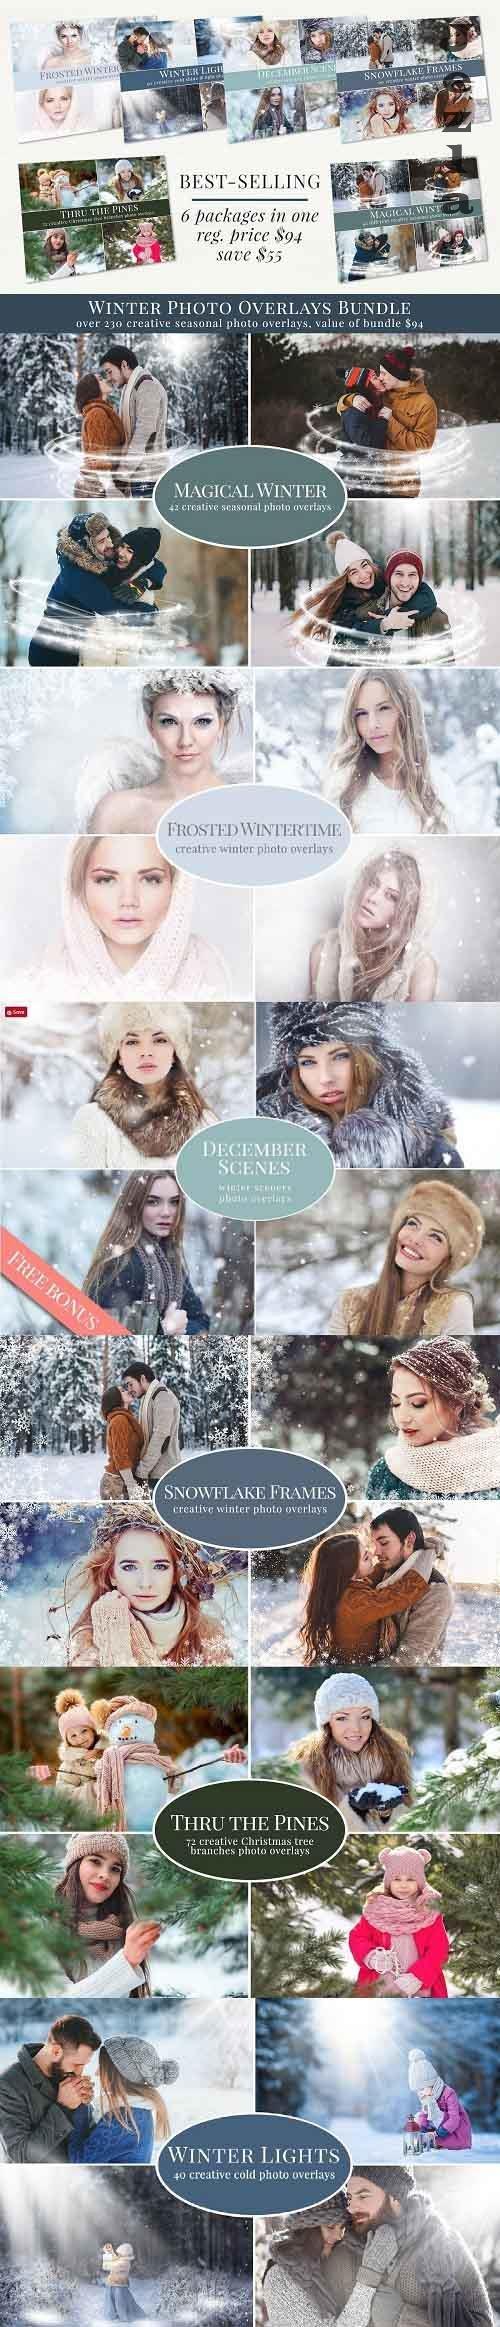 Winter Photo Overlays Bundle - 5497633